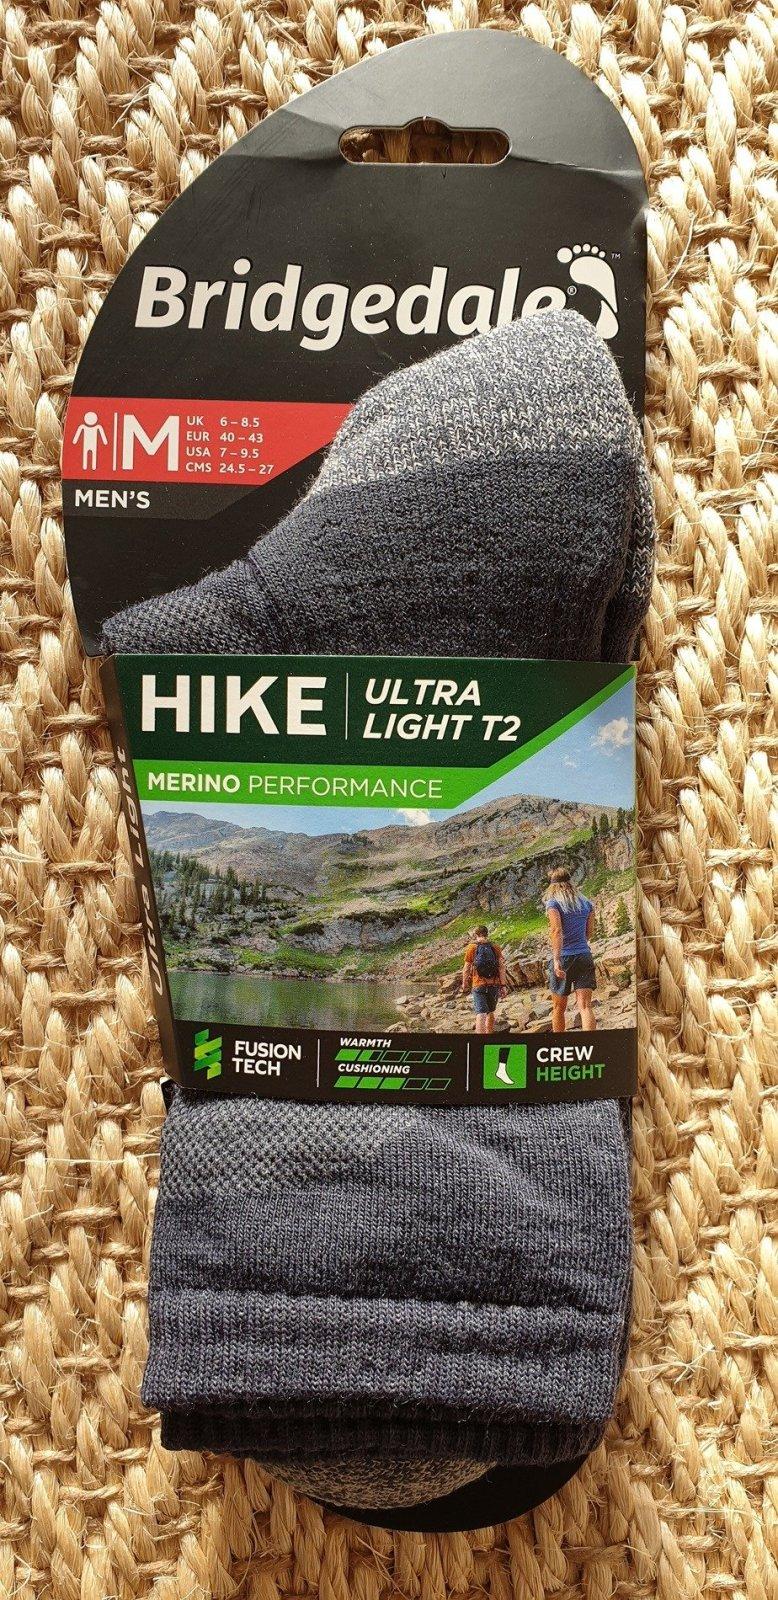 Bridgedale Hike Ultra Light T2 sock Review